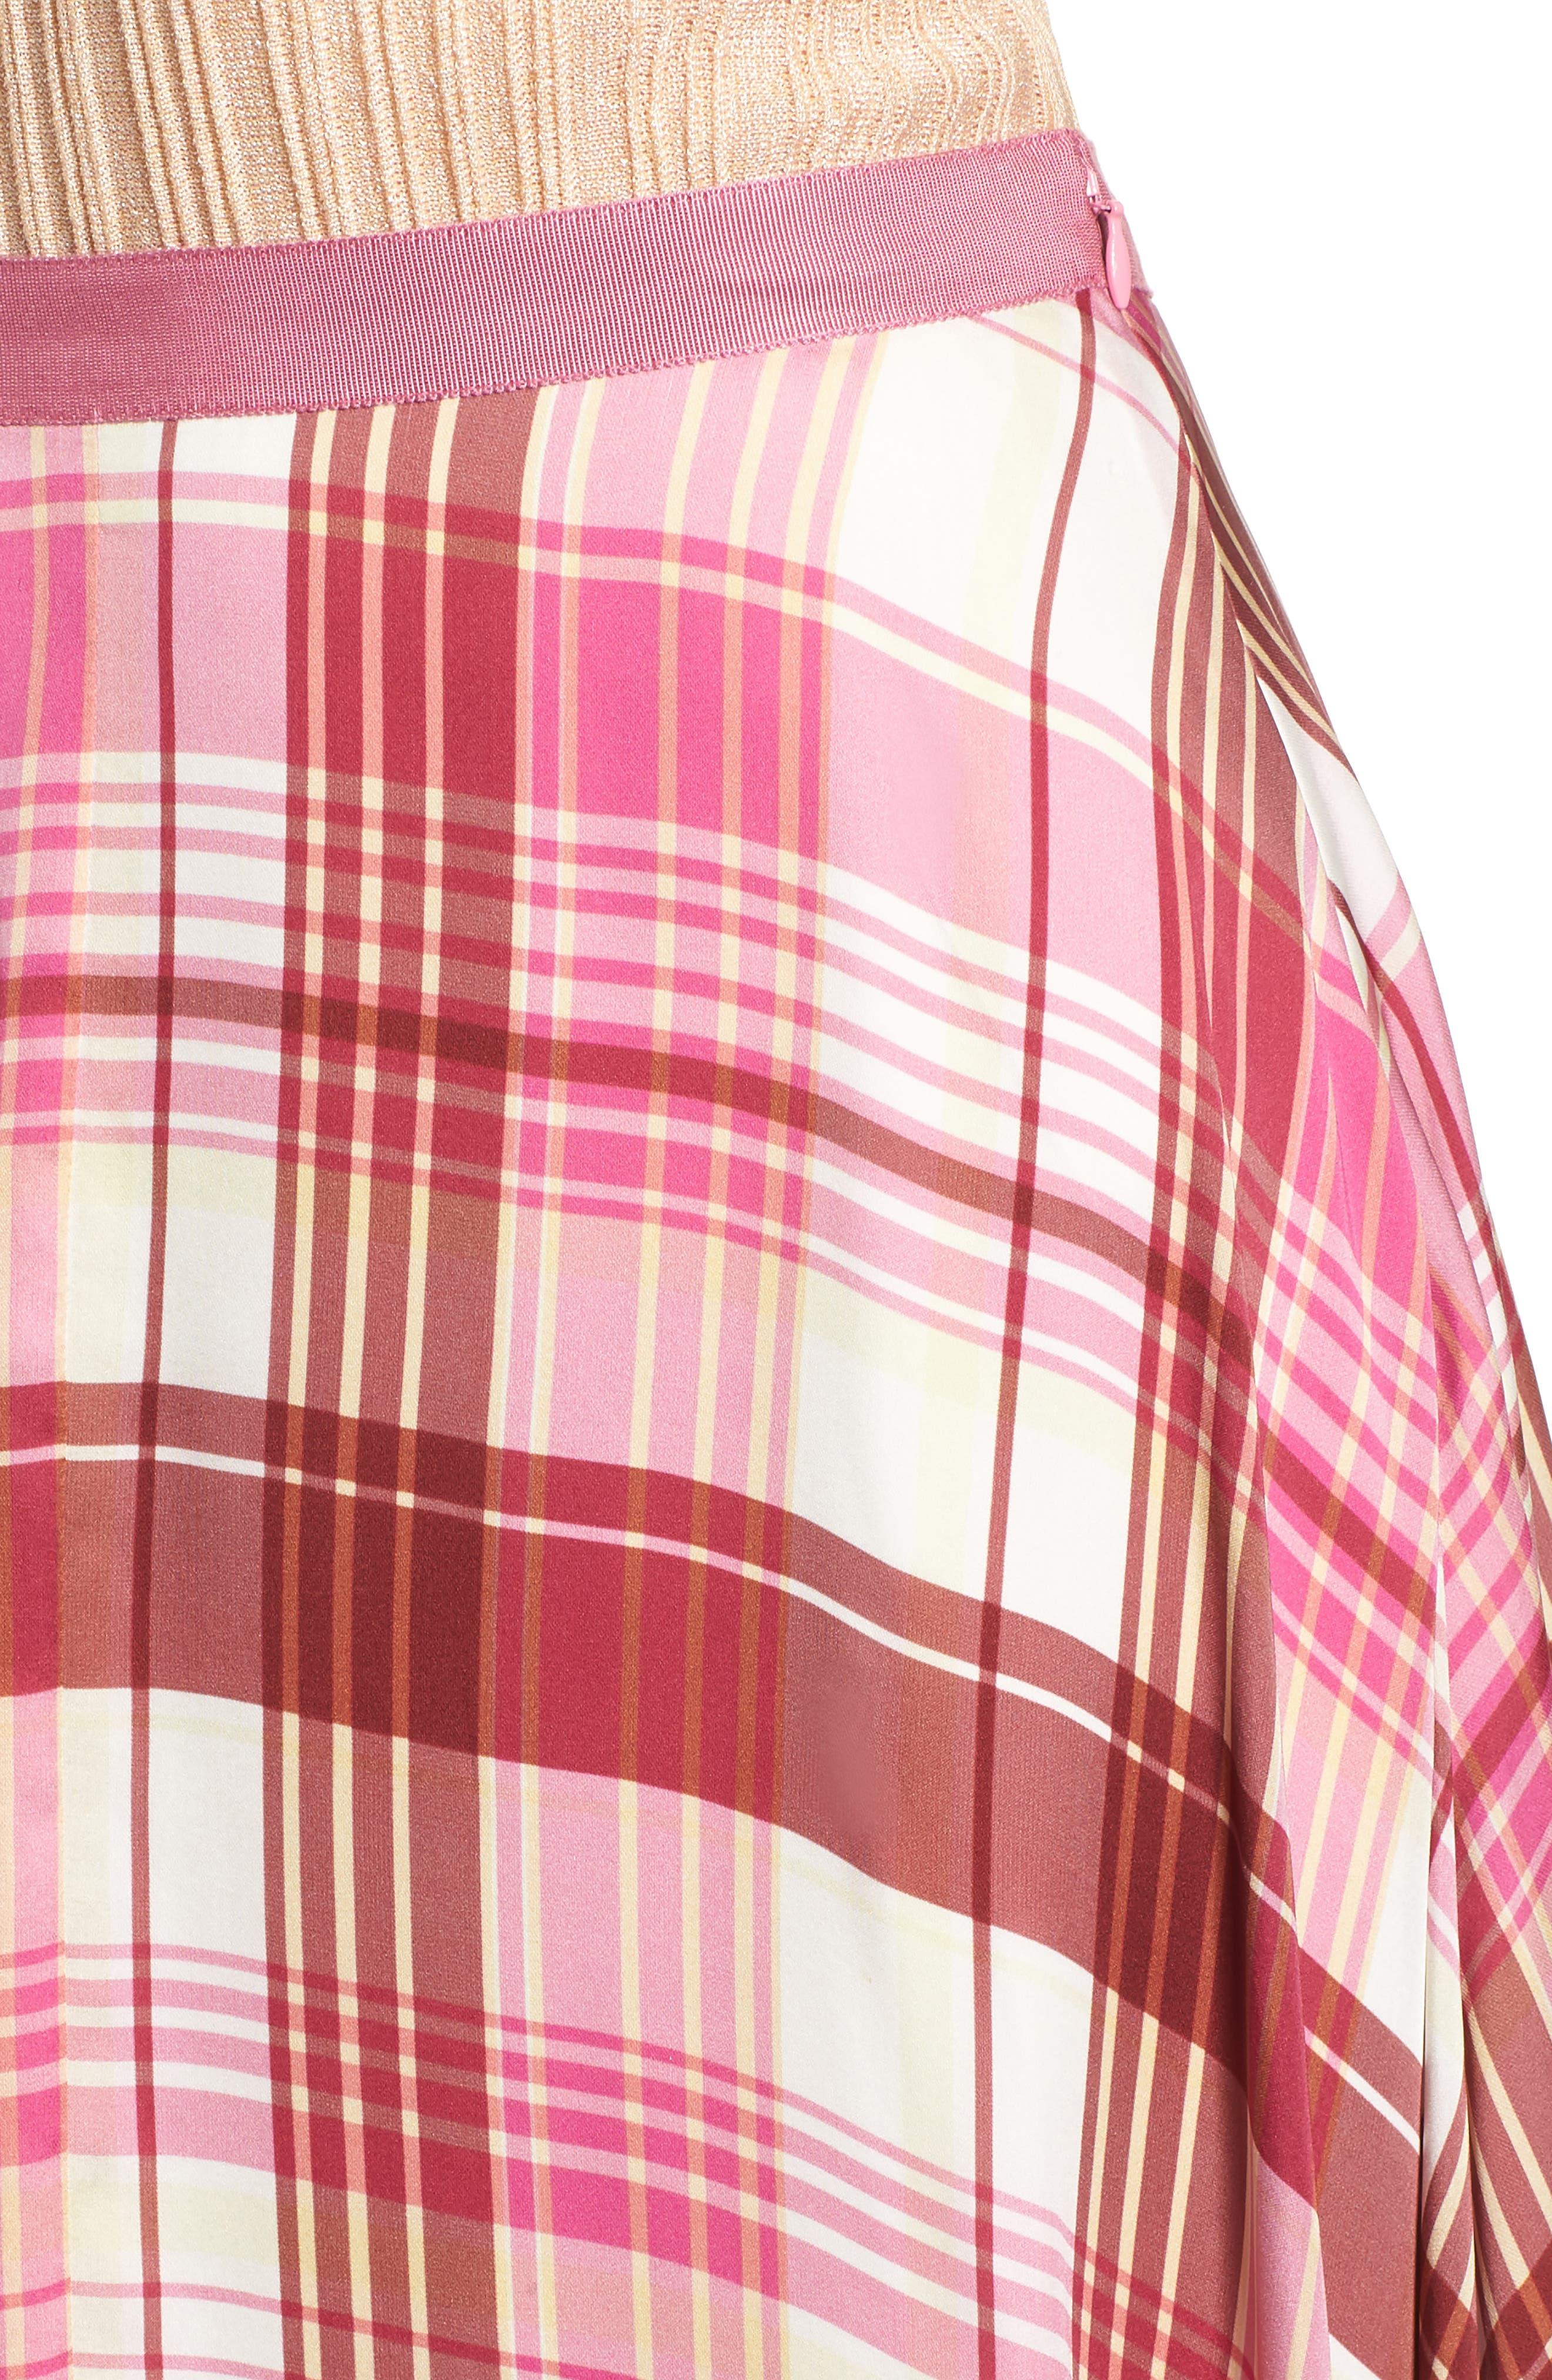 Plaid Silk Skirt,                             Alternate thumbnail 4, color,                             PINK PHLOX LARA PLAID